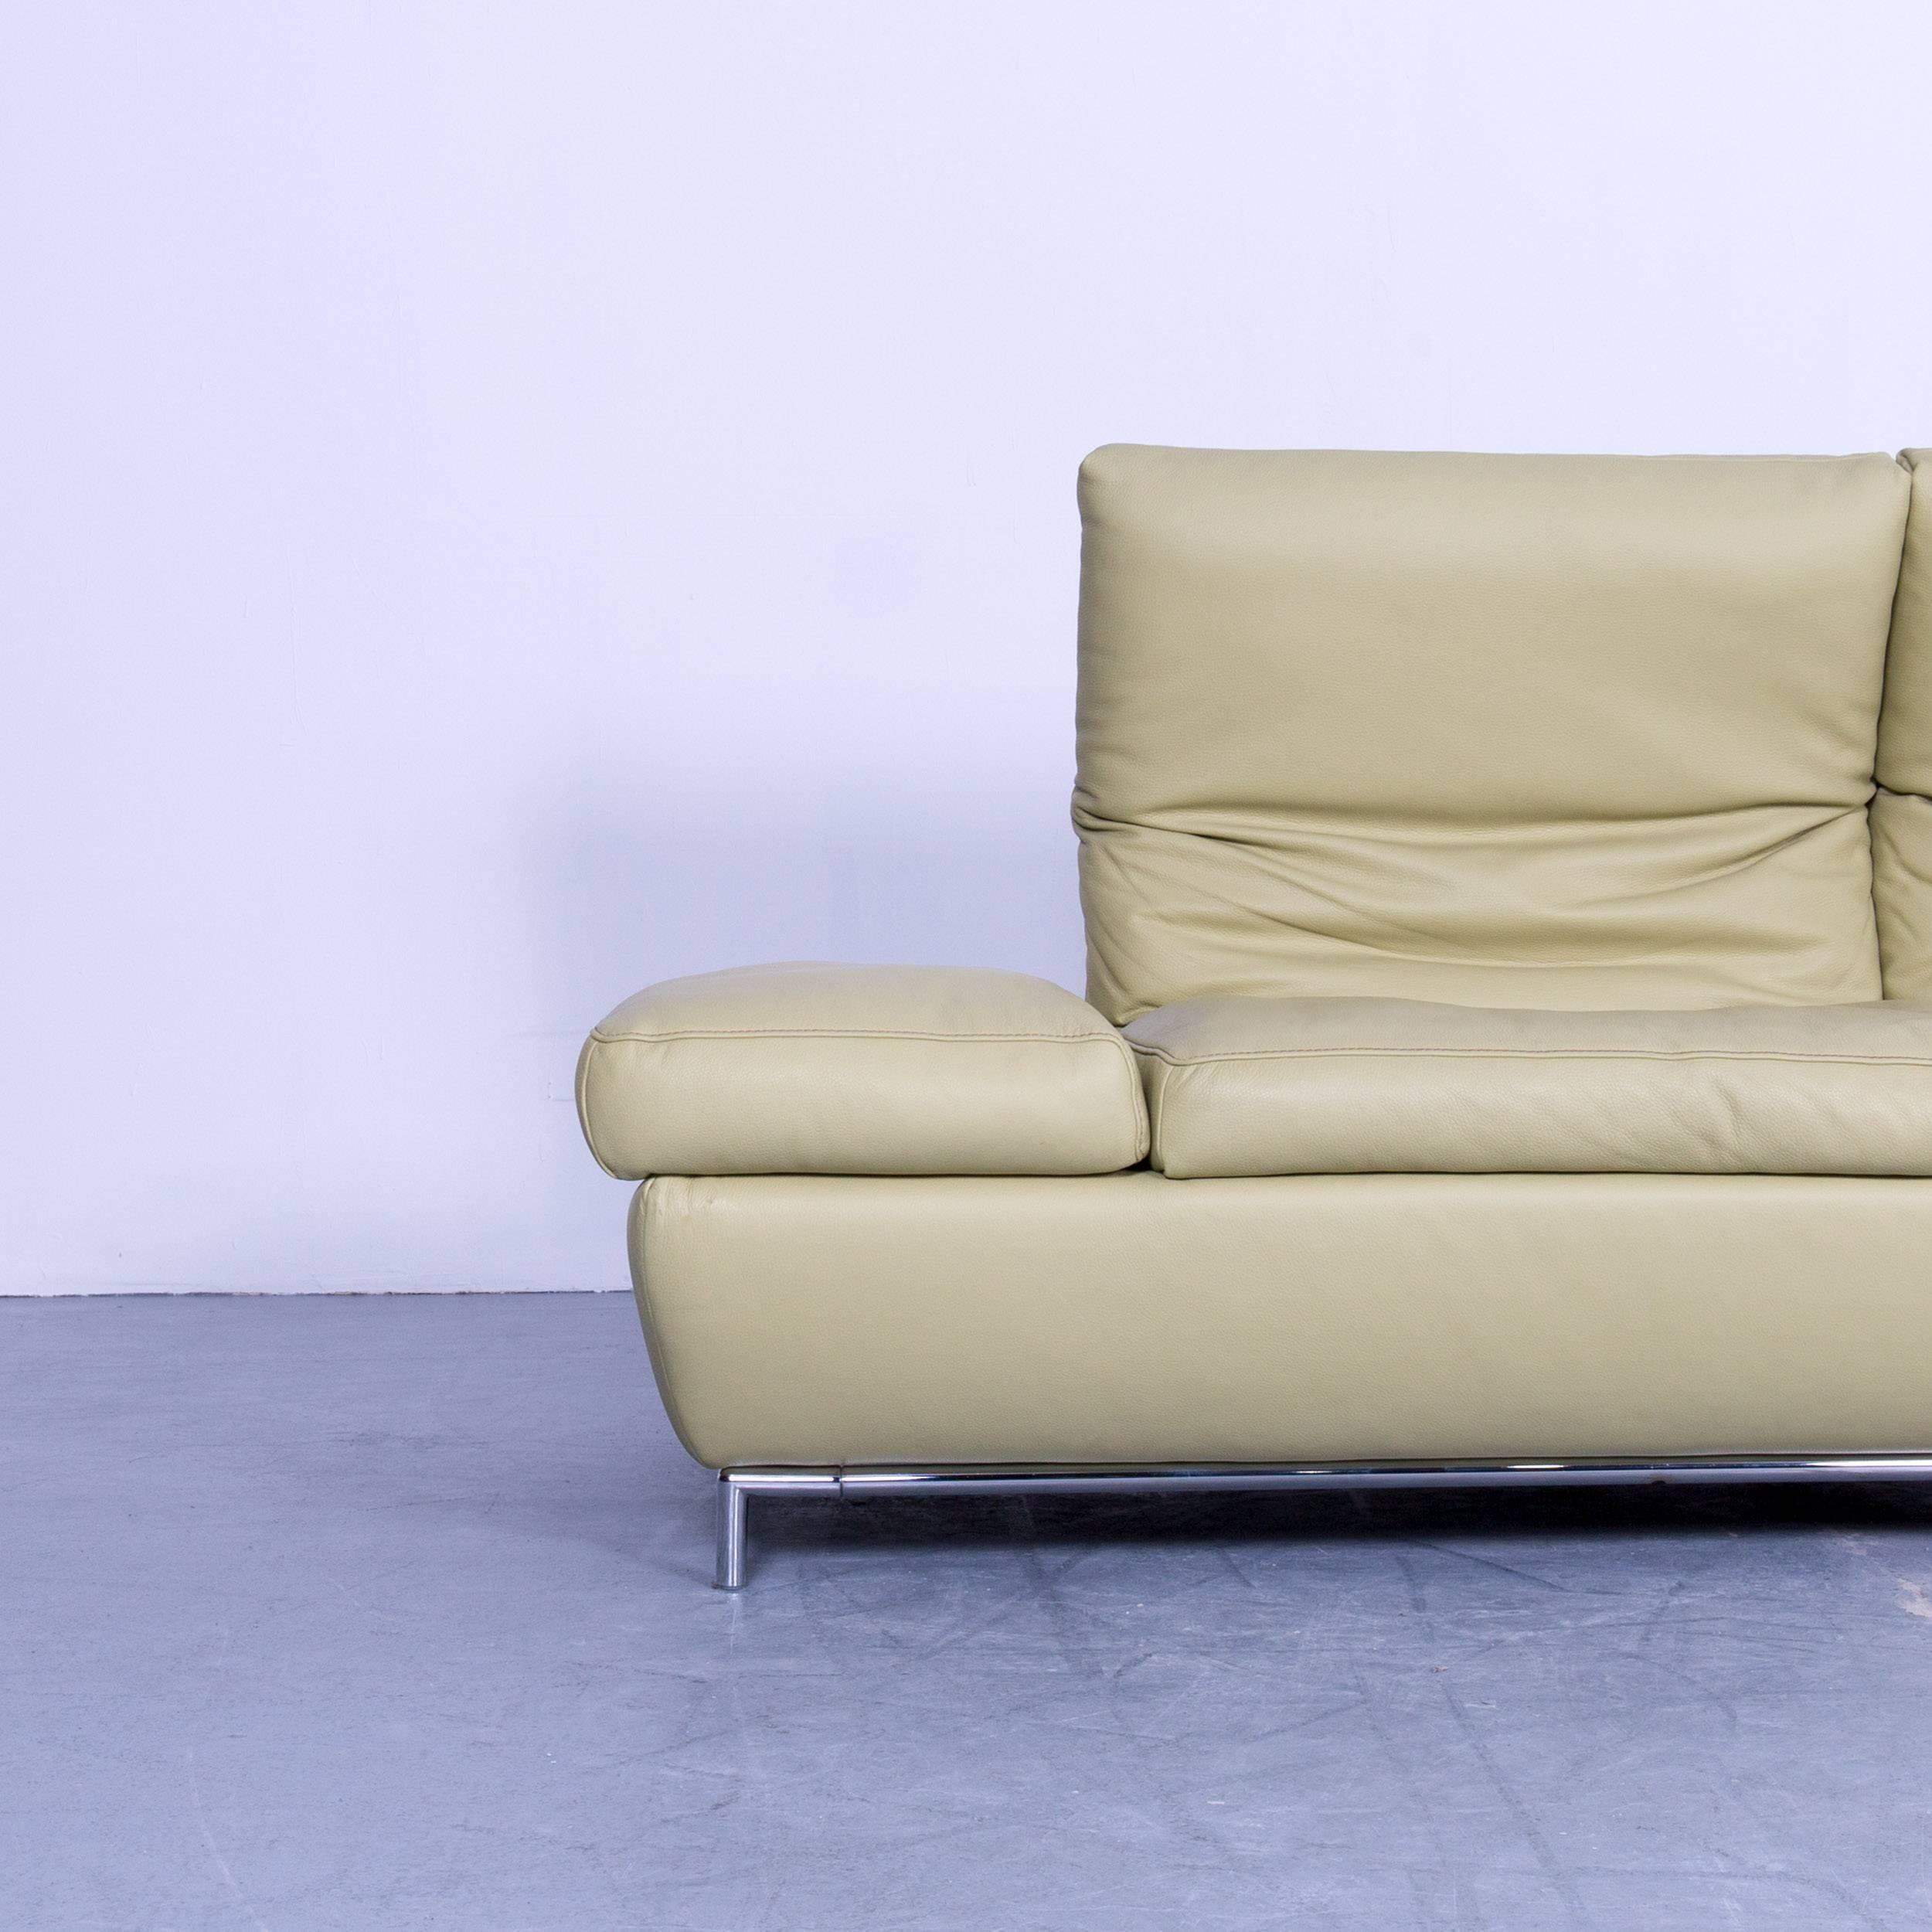 Koinor Designer Three Seat Sofa In Light Green In A Minimalistic And Modern  Design,